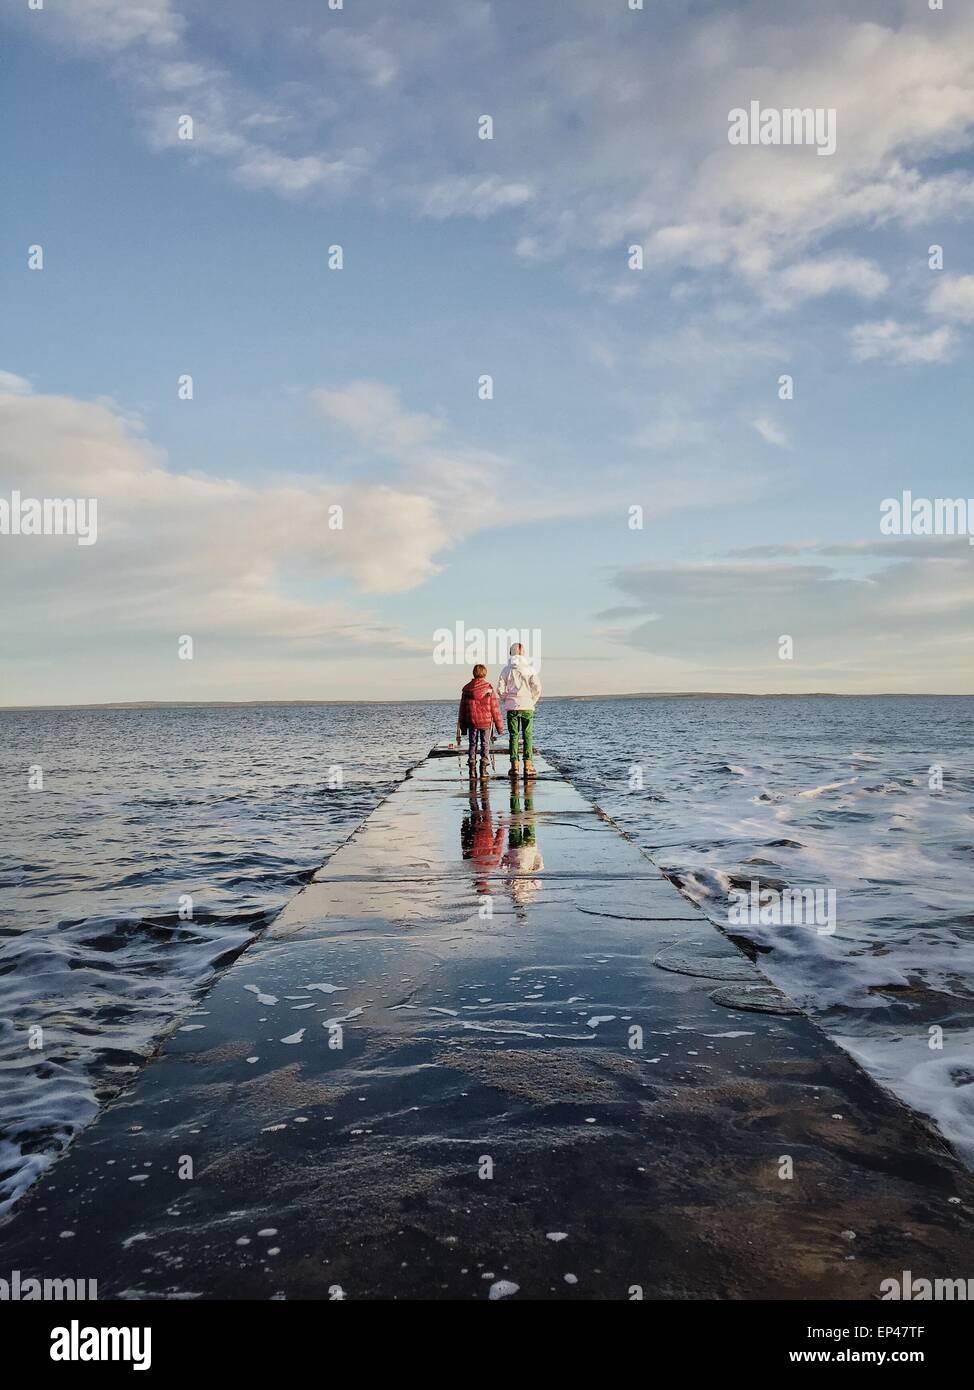 Deux garçons à la mer, à l'Oslofjord, Tonsberg, Norvège Photo Stock